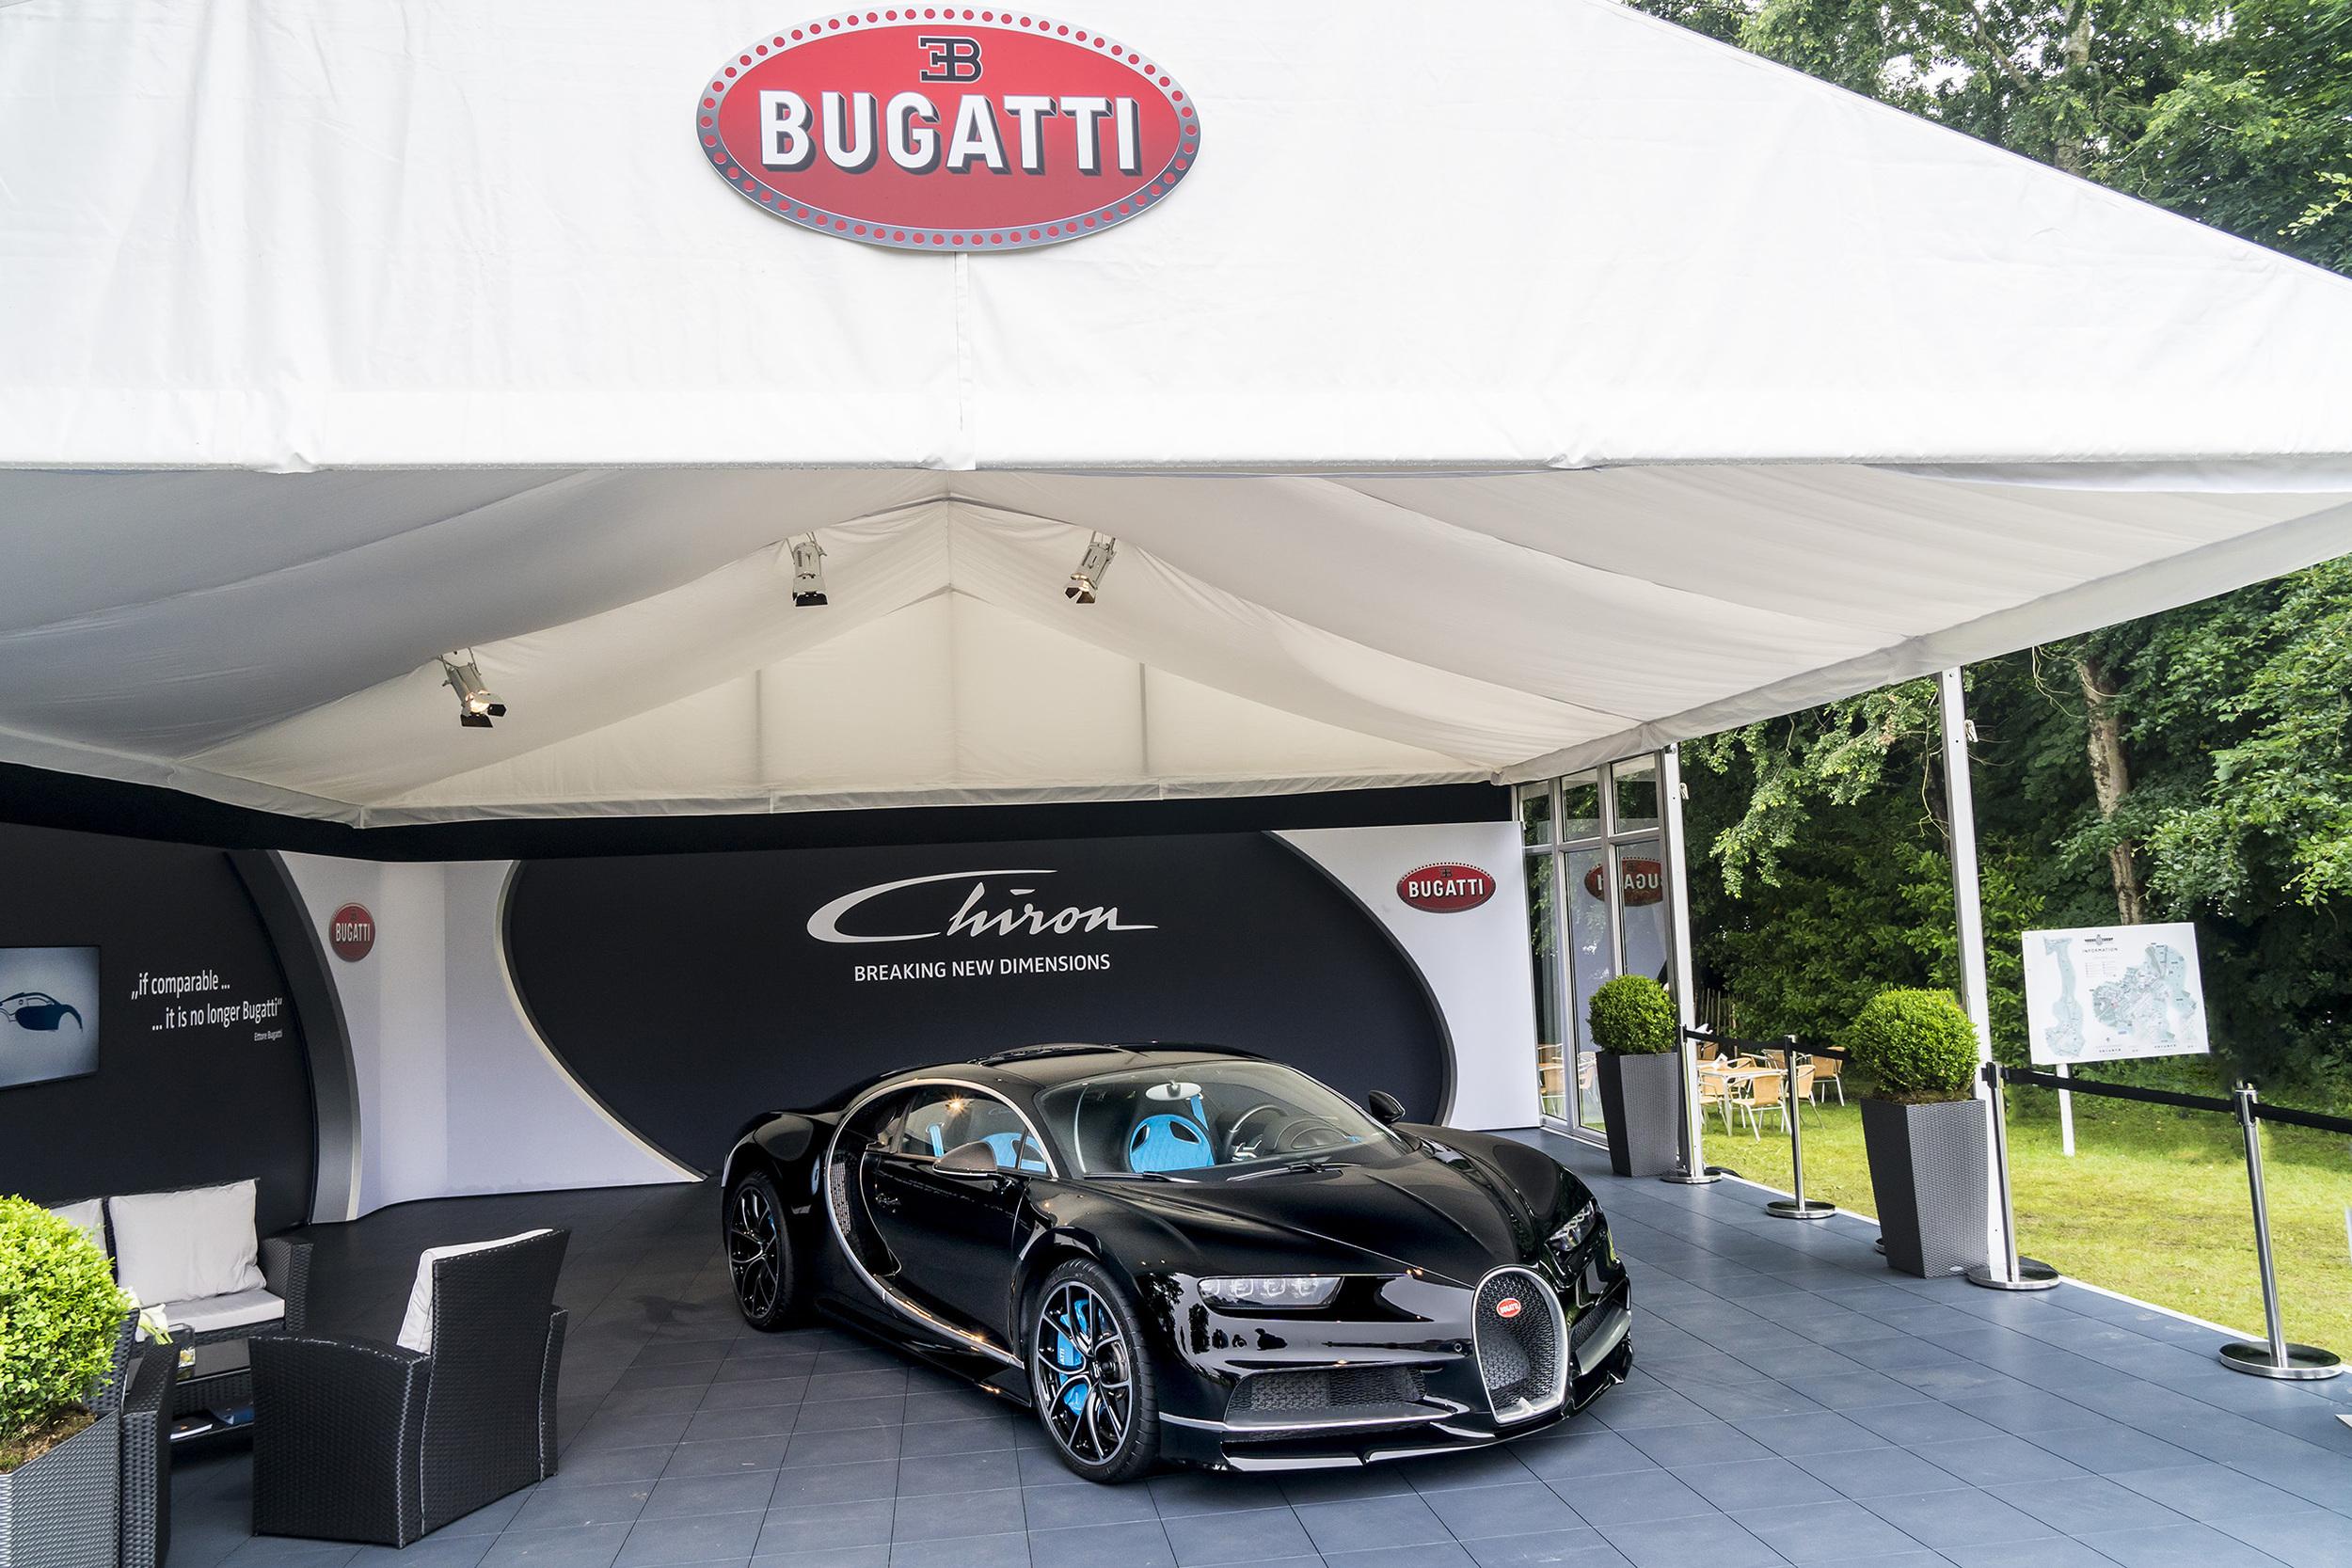 01_Bugatti_Chiron_Goodwood.jpg